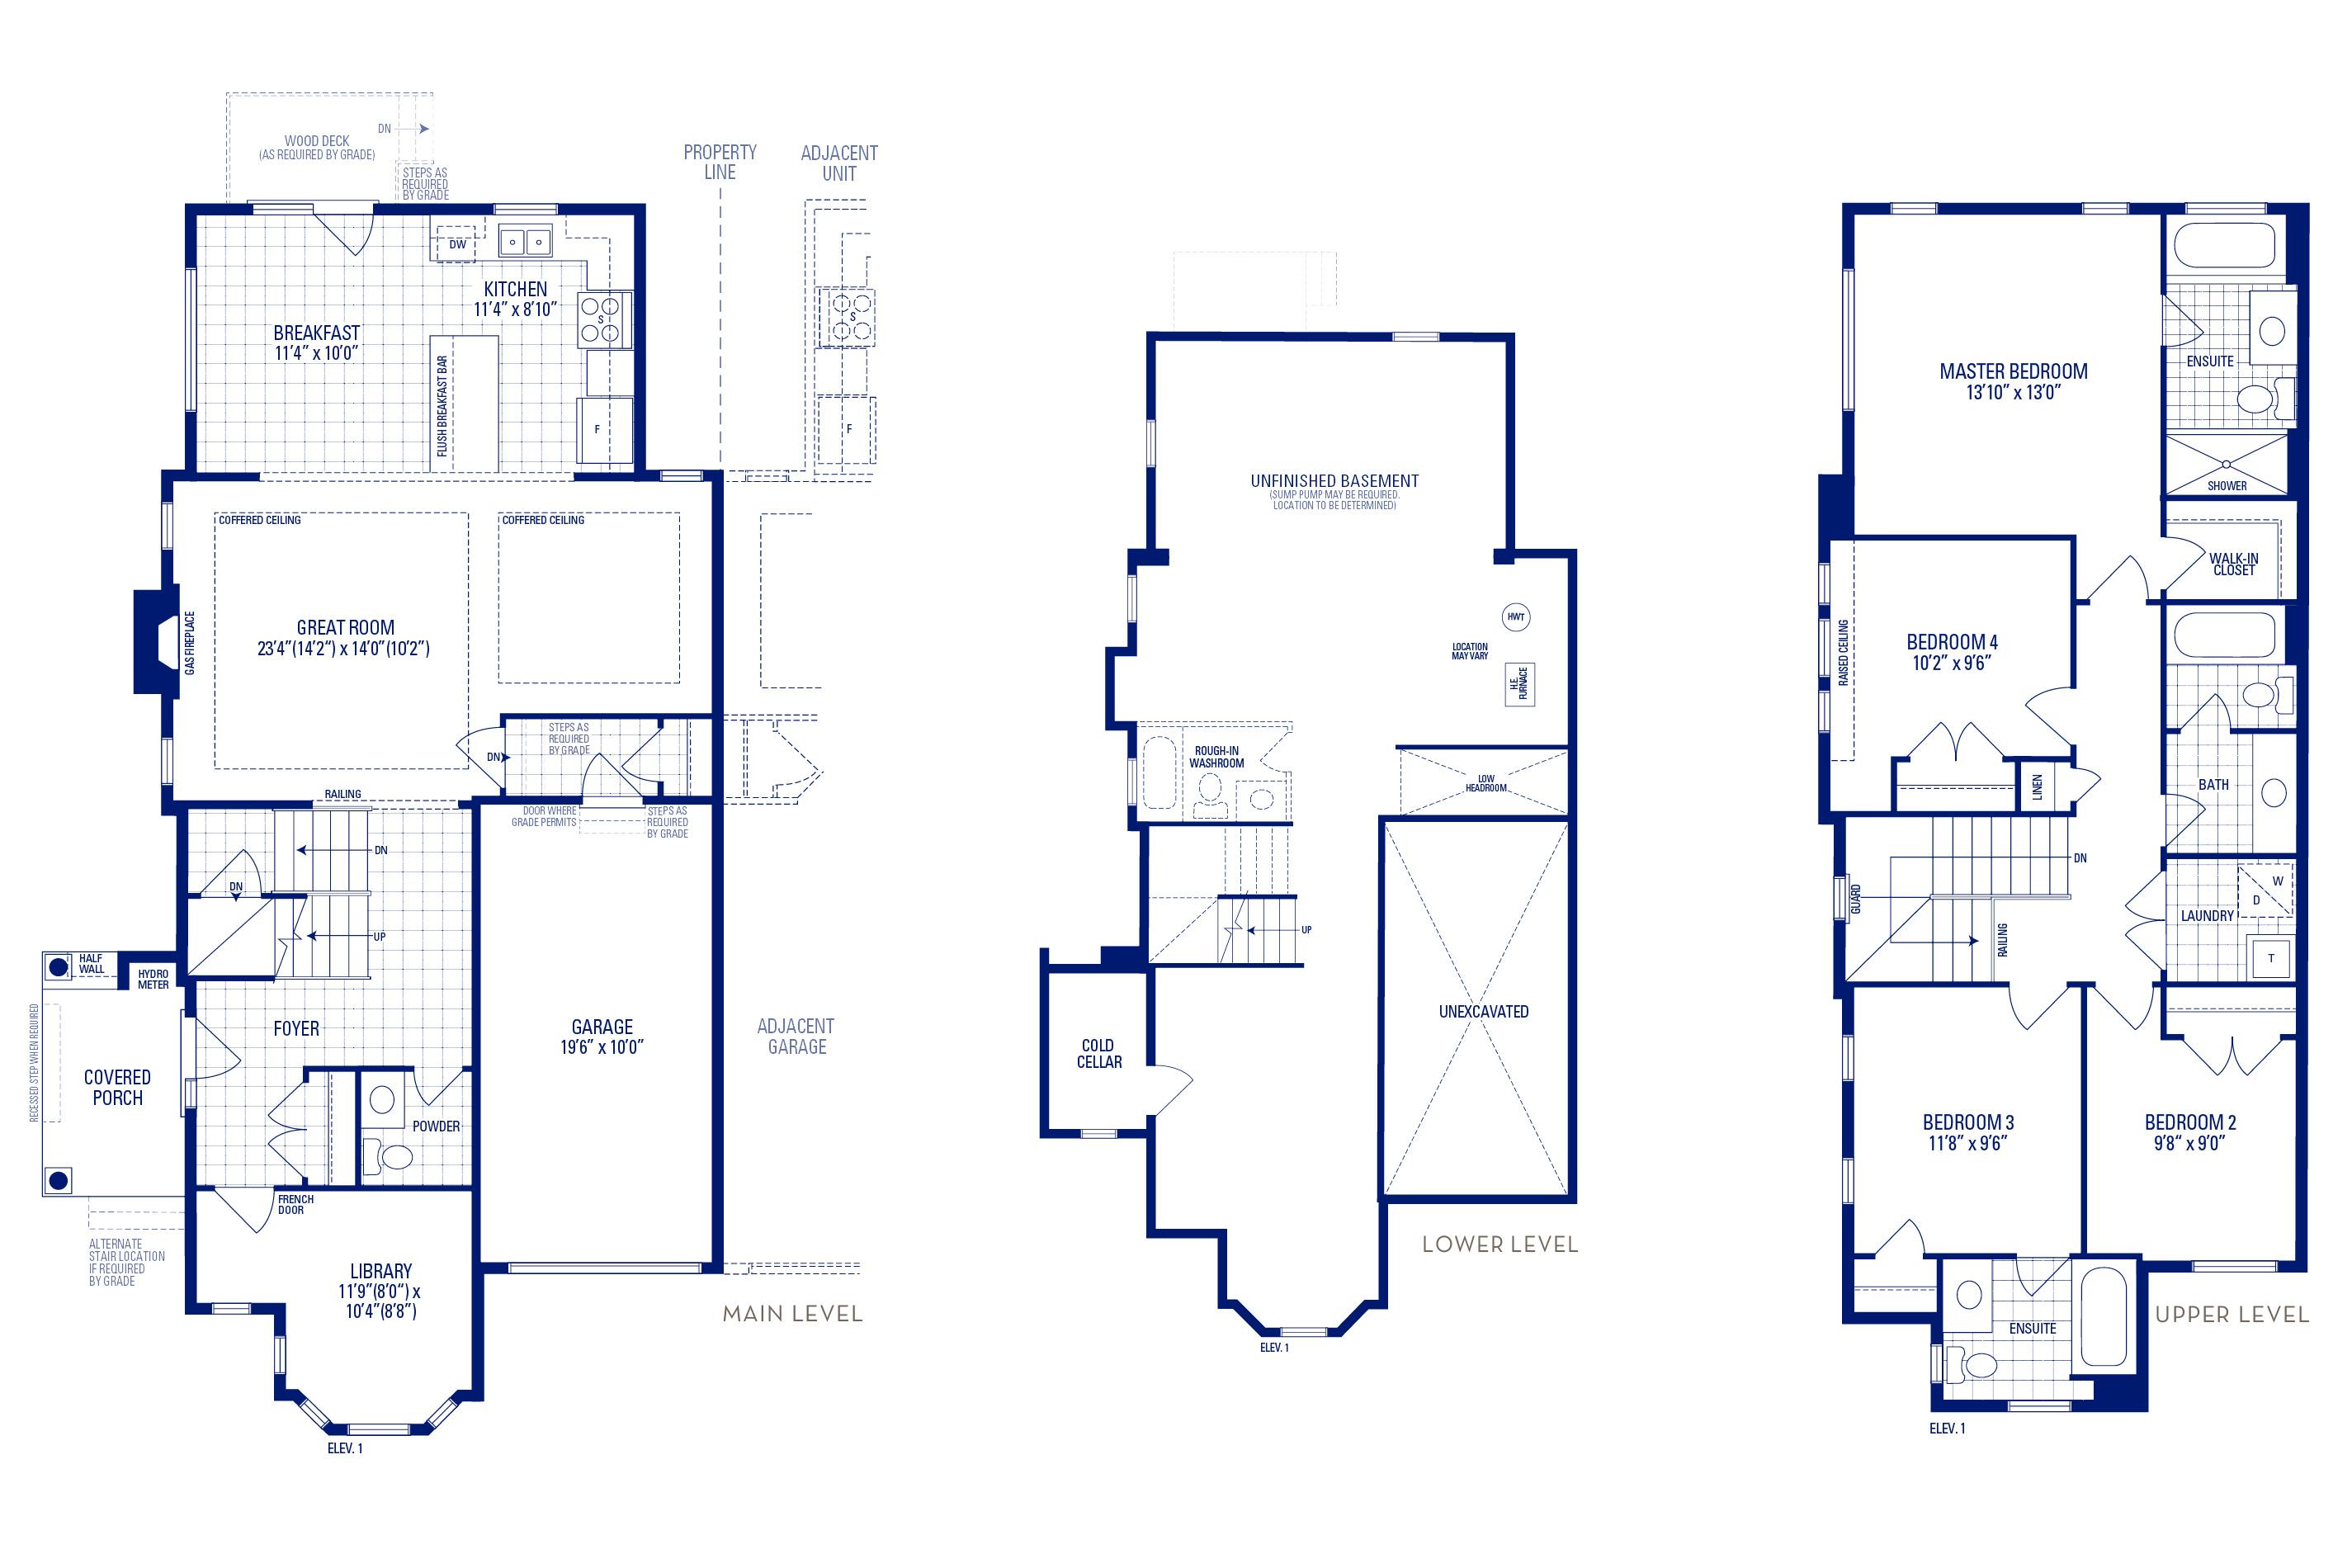 Newberry 12 Elev. 1 Floorplan